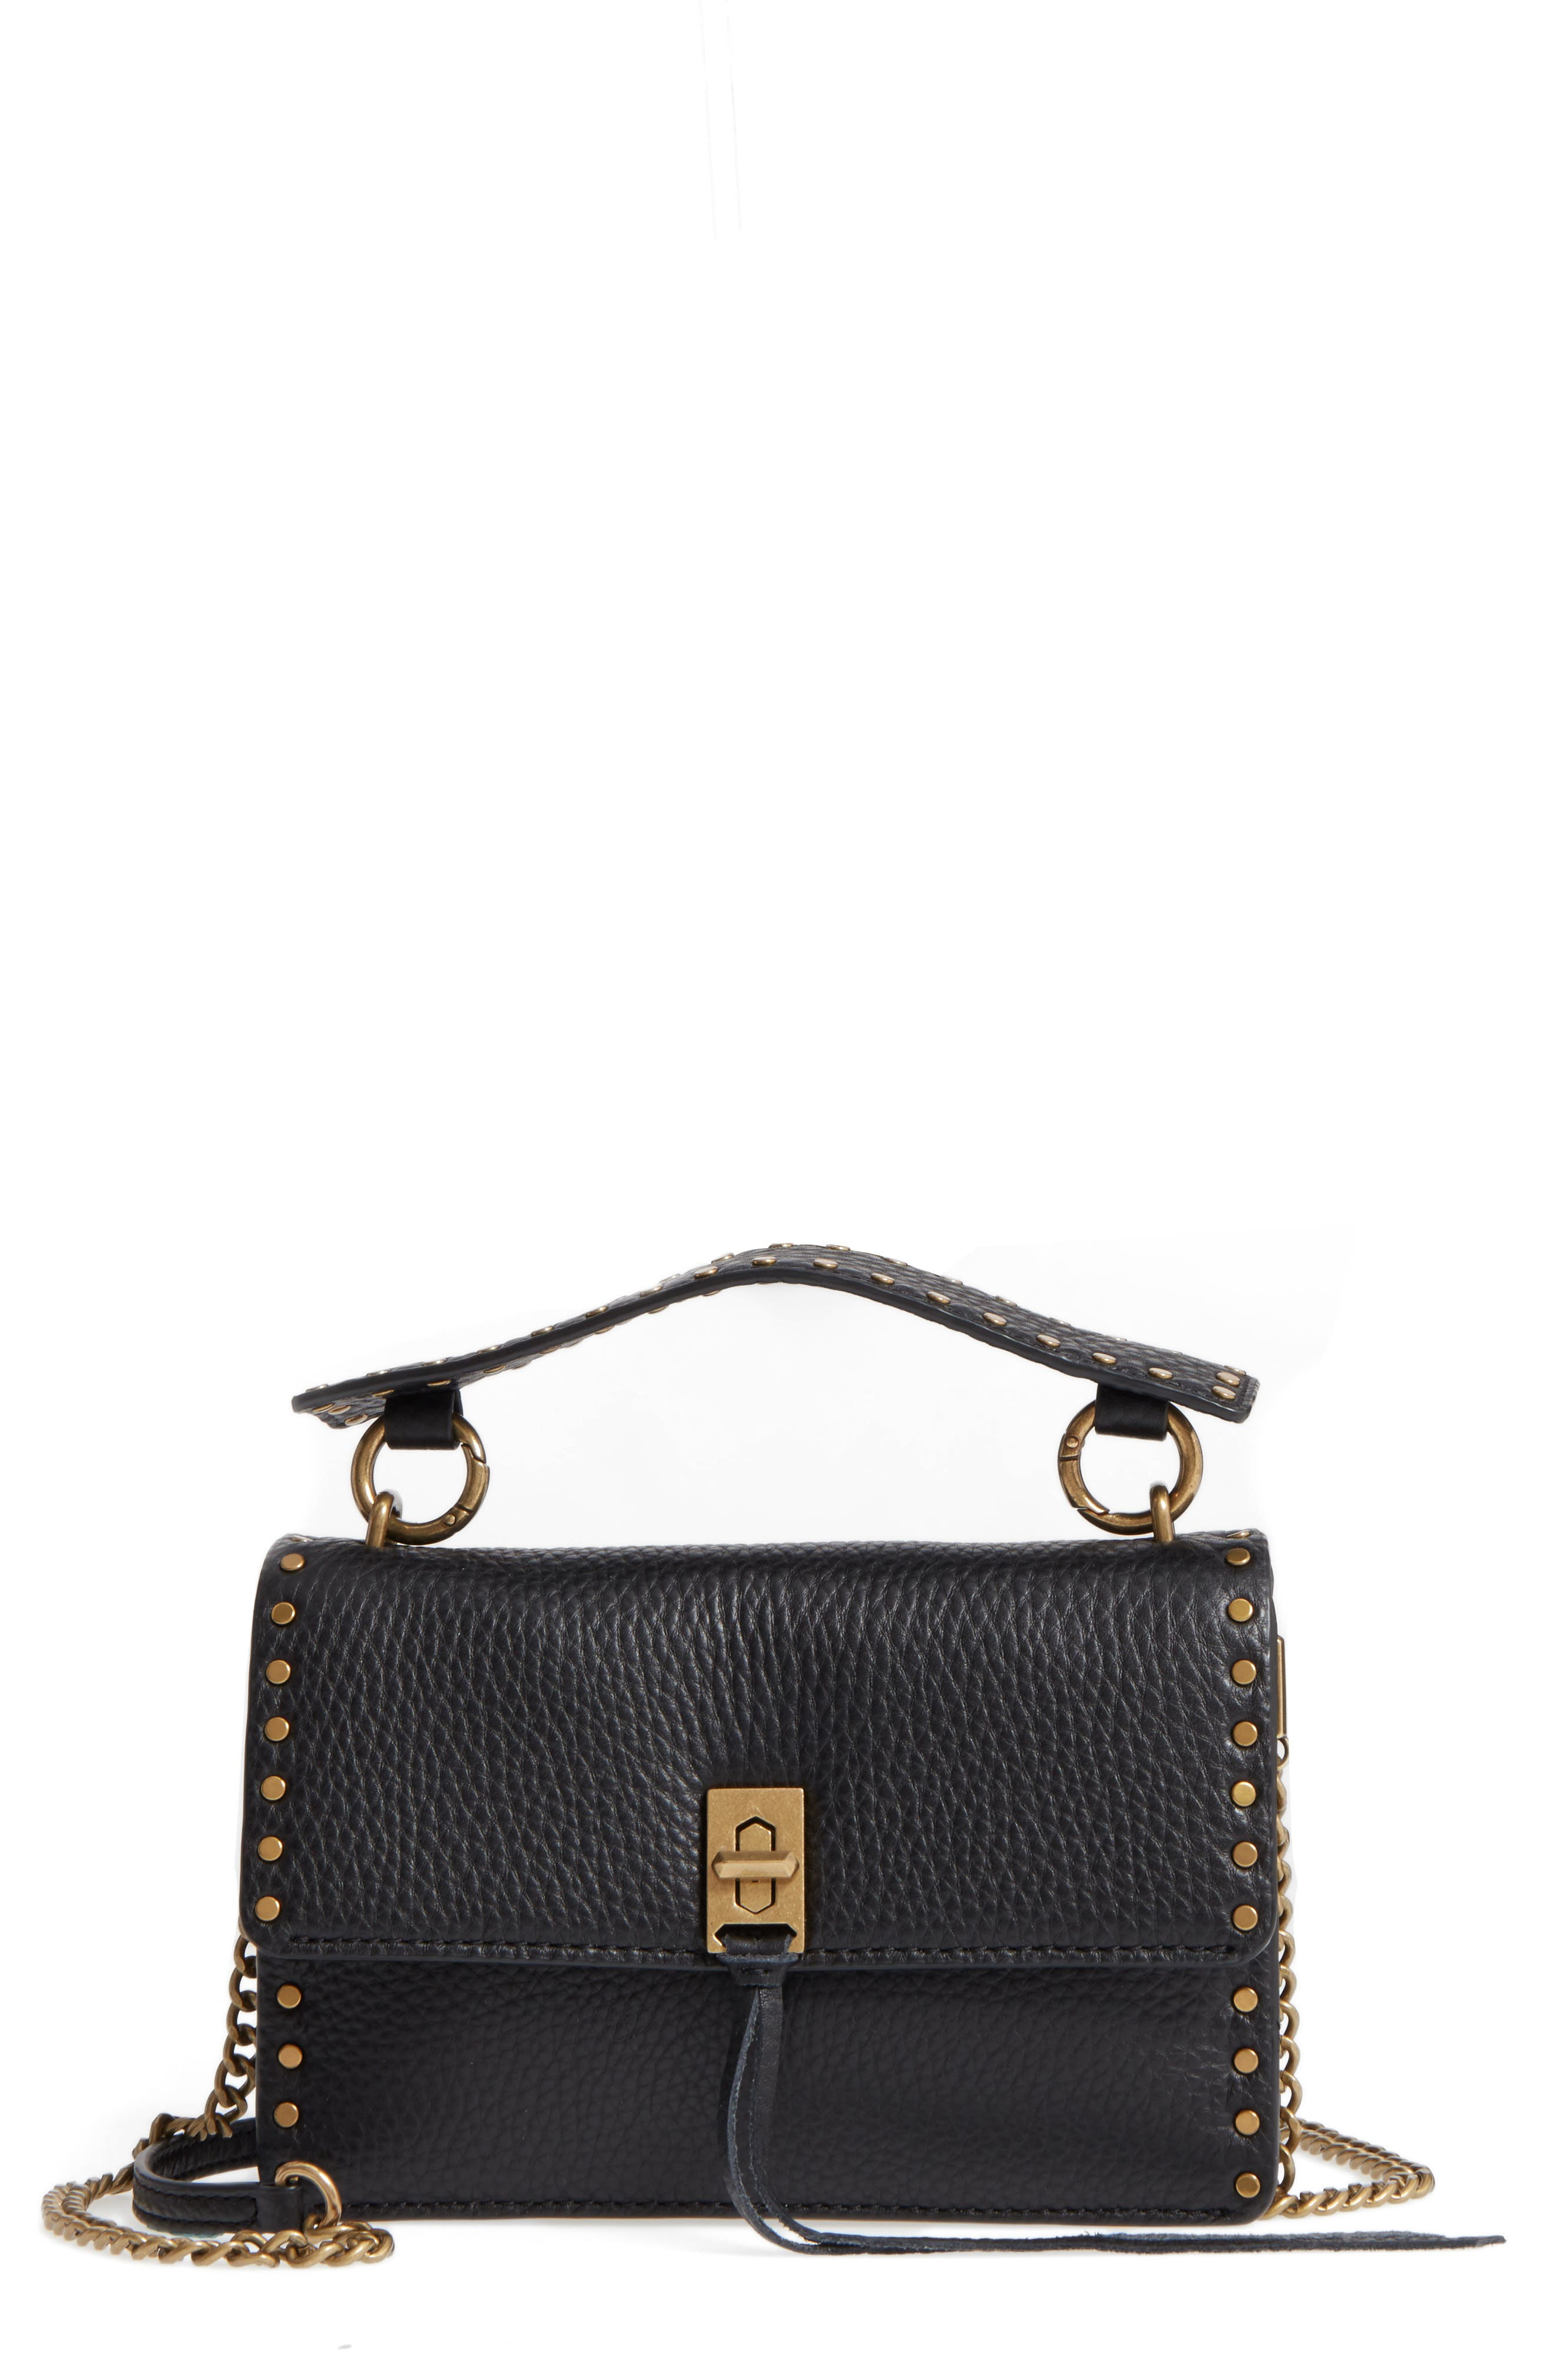 Alternate Image 1 Selected - Rebecca Minkoff Darren Top Handle Crossbody Bag